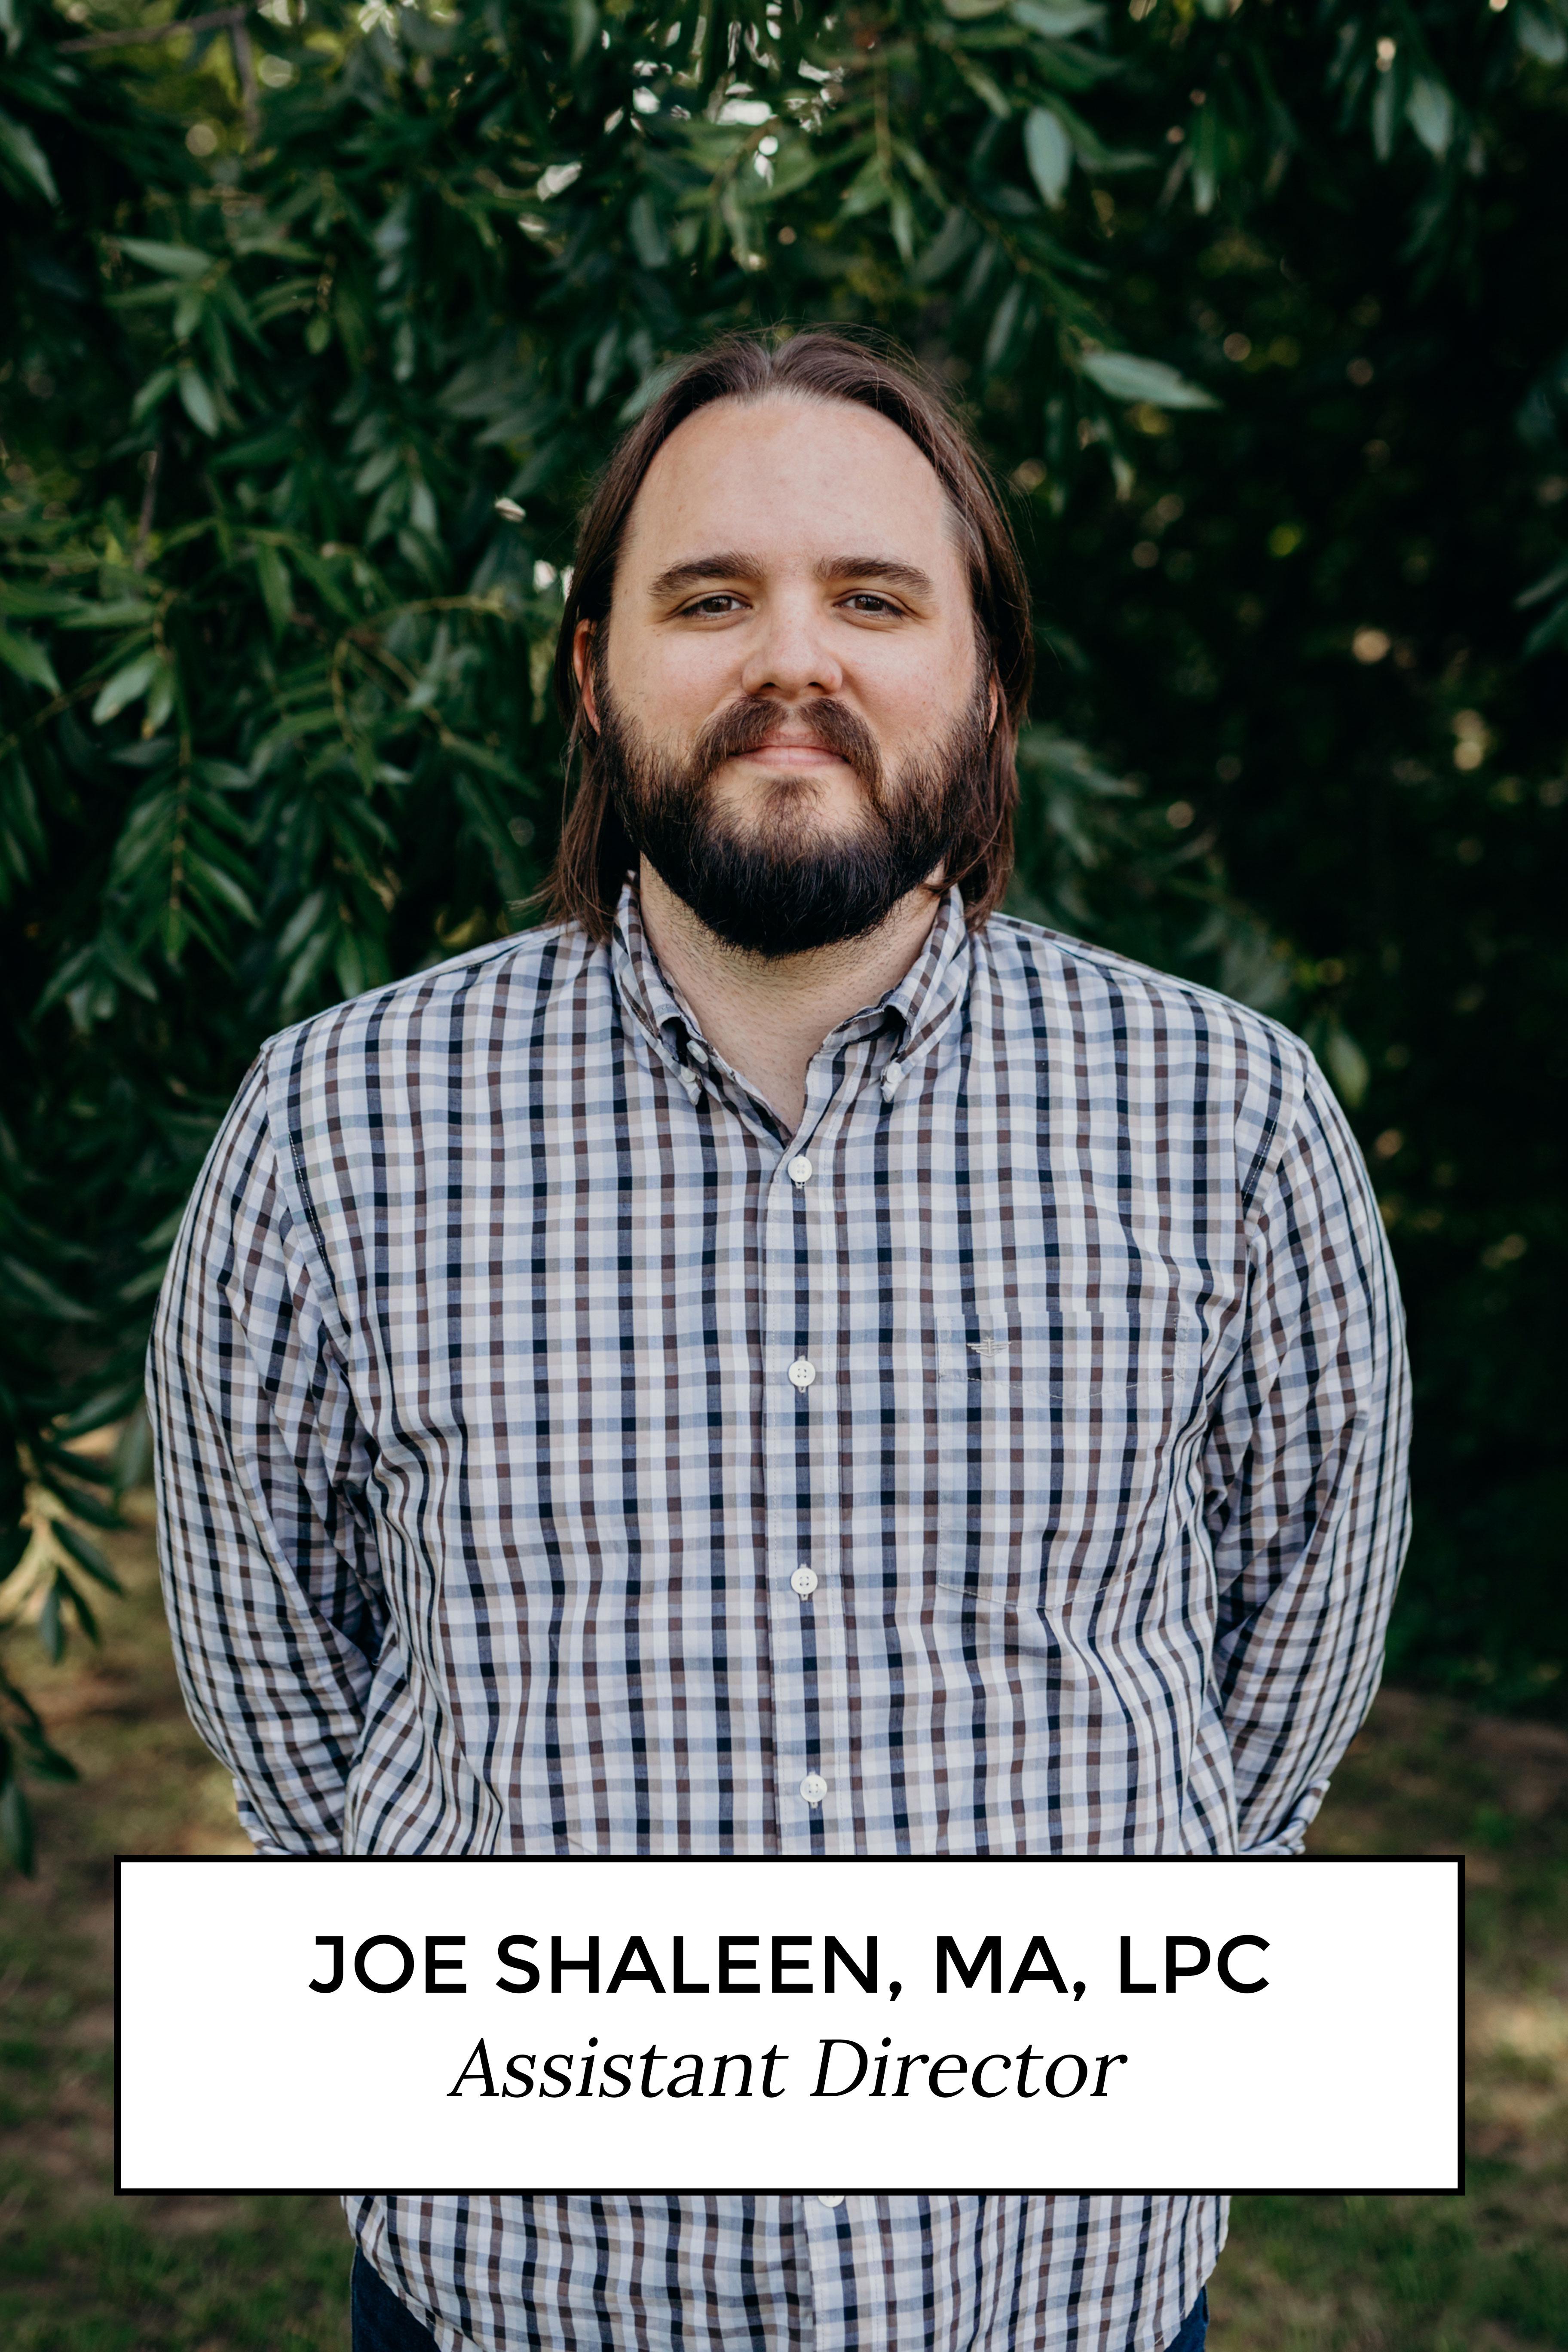 Joe Shaleen, MA, LPC - Assistant Director